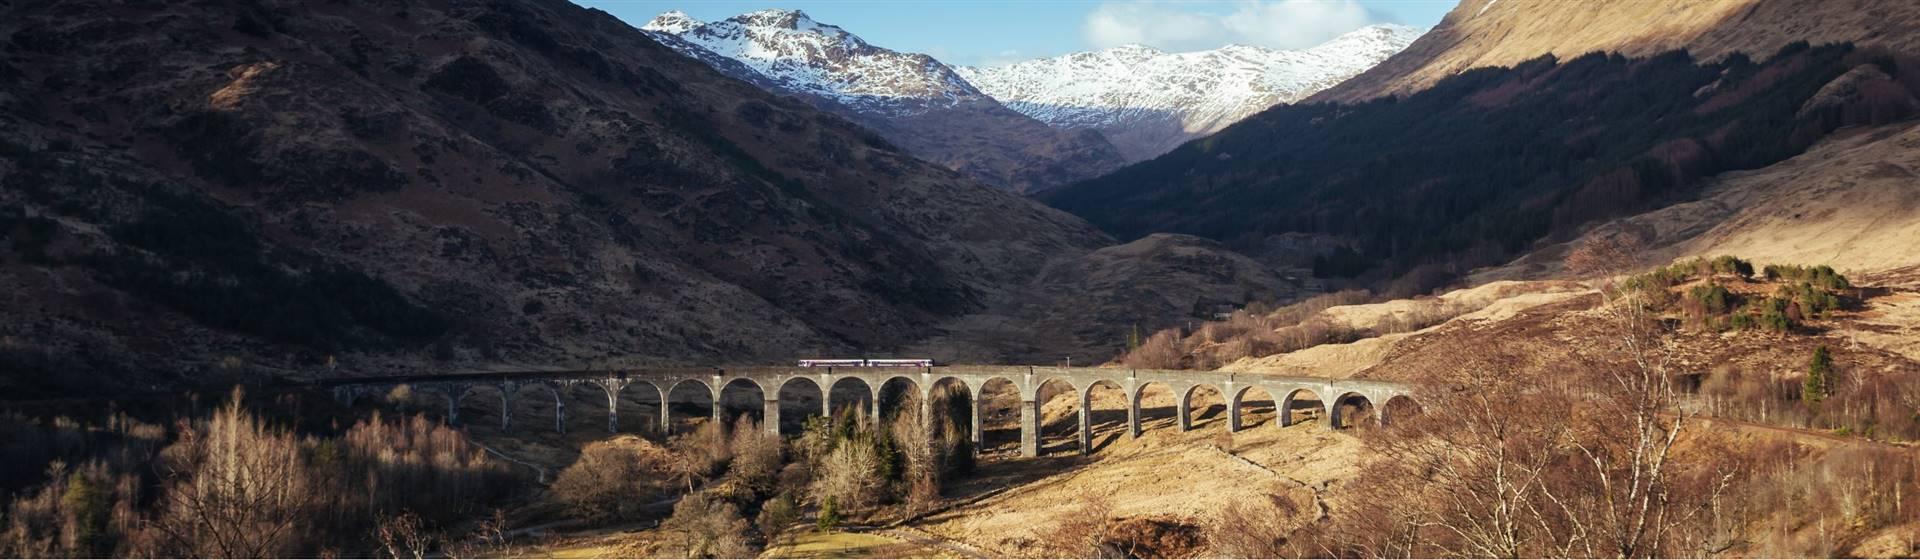 "<img src=""theglenfinnanviaductpan©istock.jpeg"" alt=""Glenfinnan Viaduct""/>"